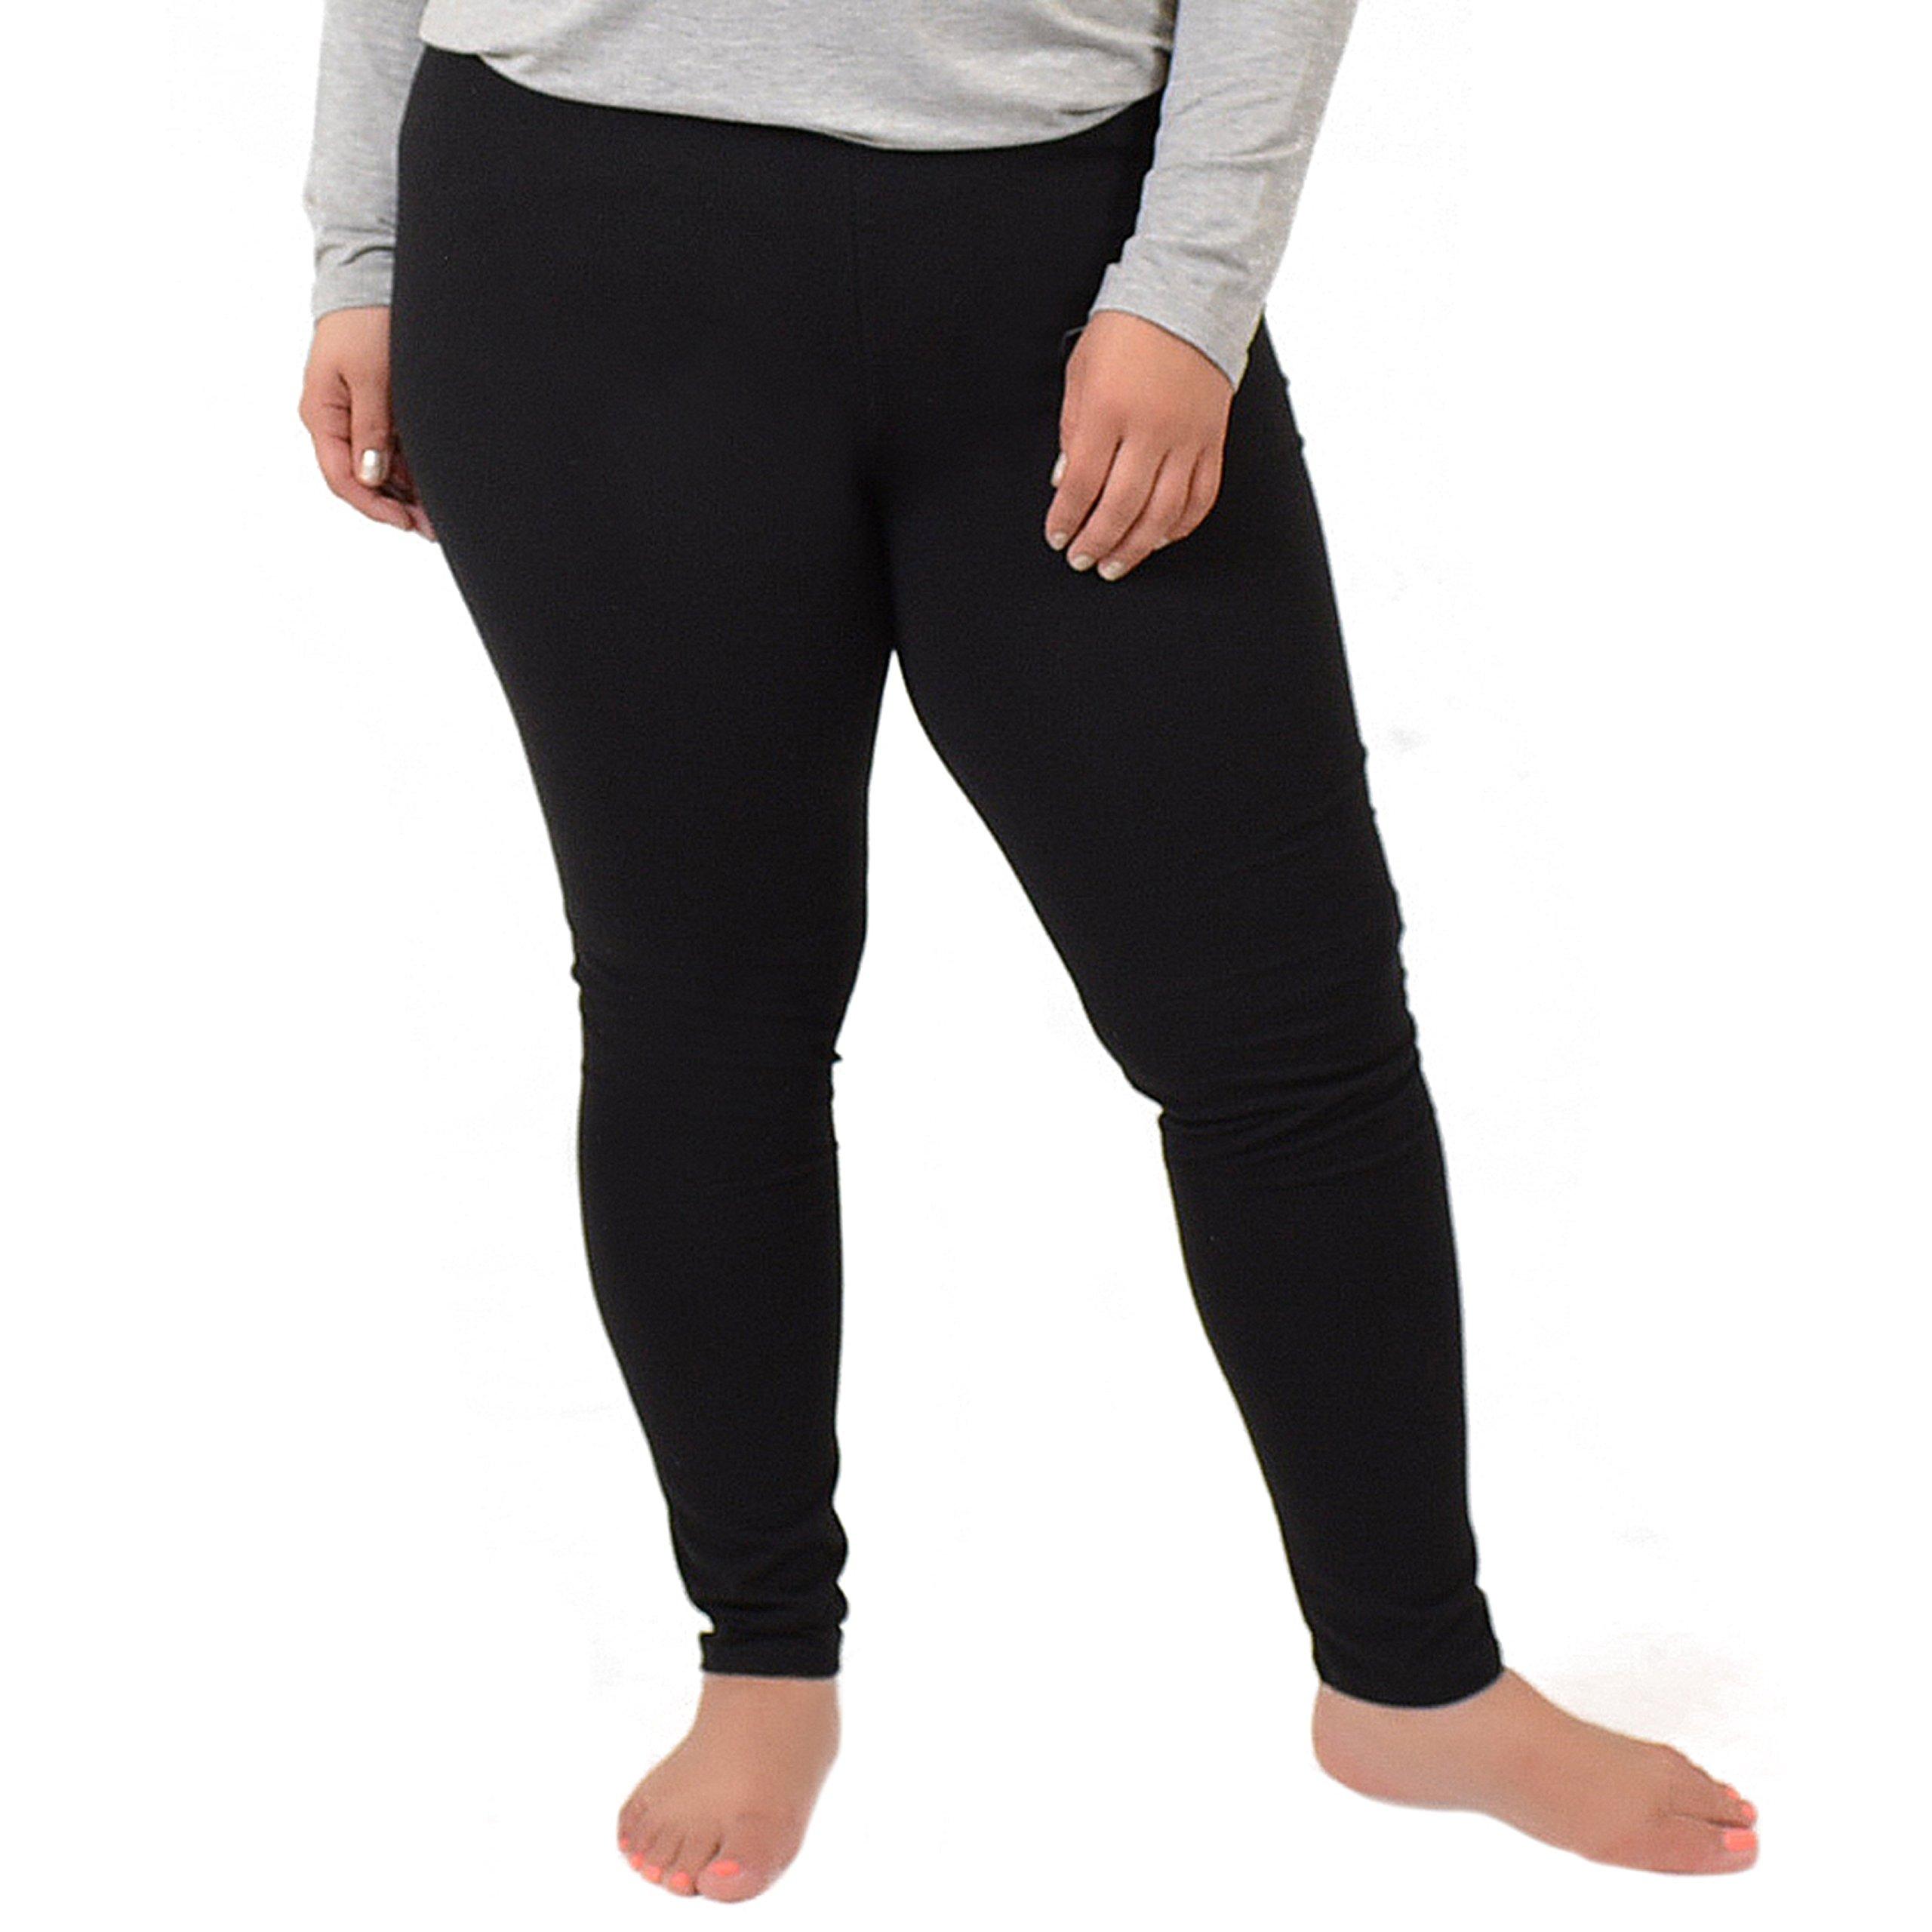 Stretch is Comfort Women's Plus Size Leggings Black X-Large